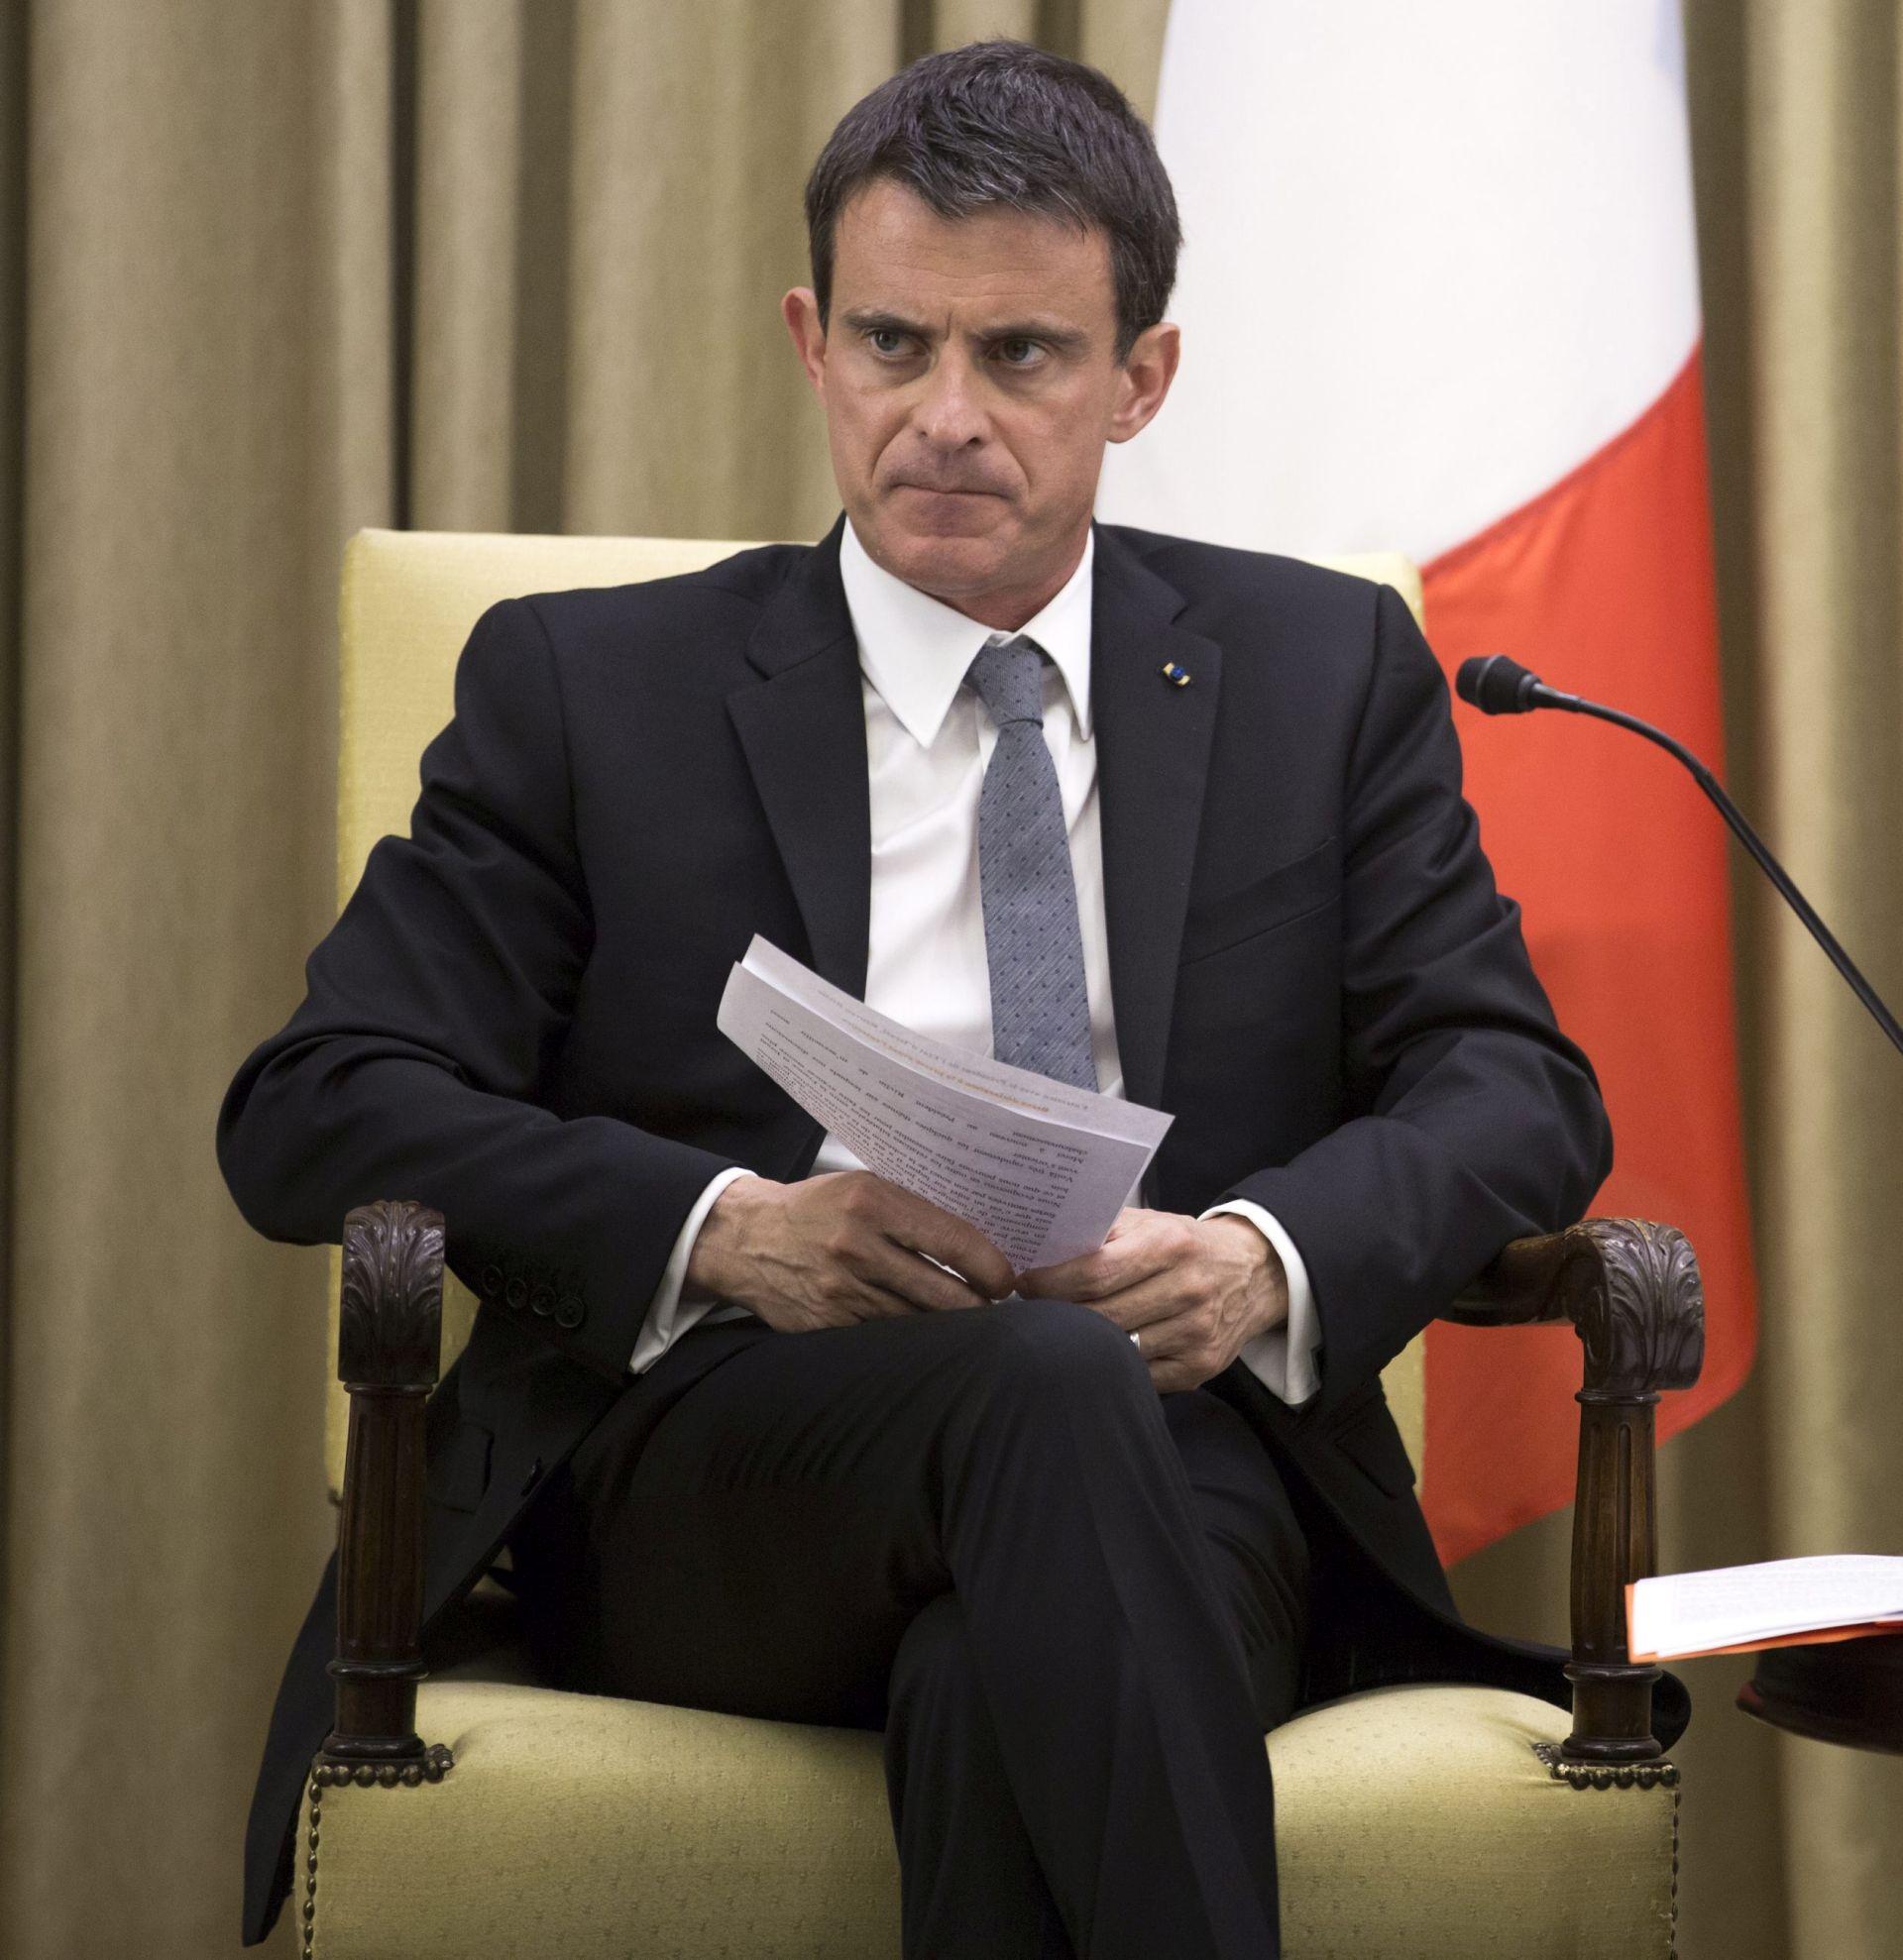 Manuel Valls: Ekstremist kojeg smo uhitili u ožujku planirao veliki napad na Euru